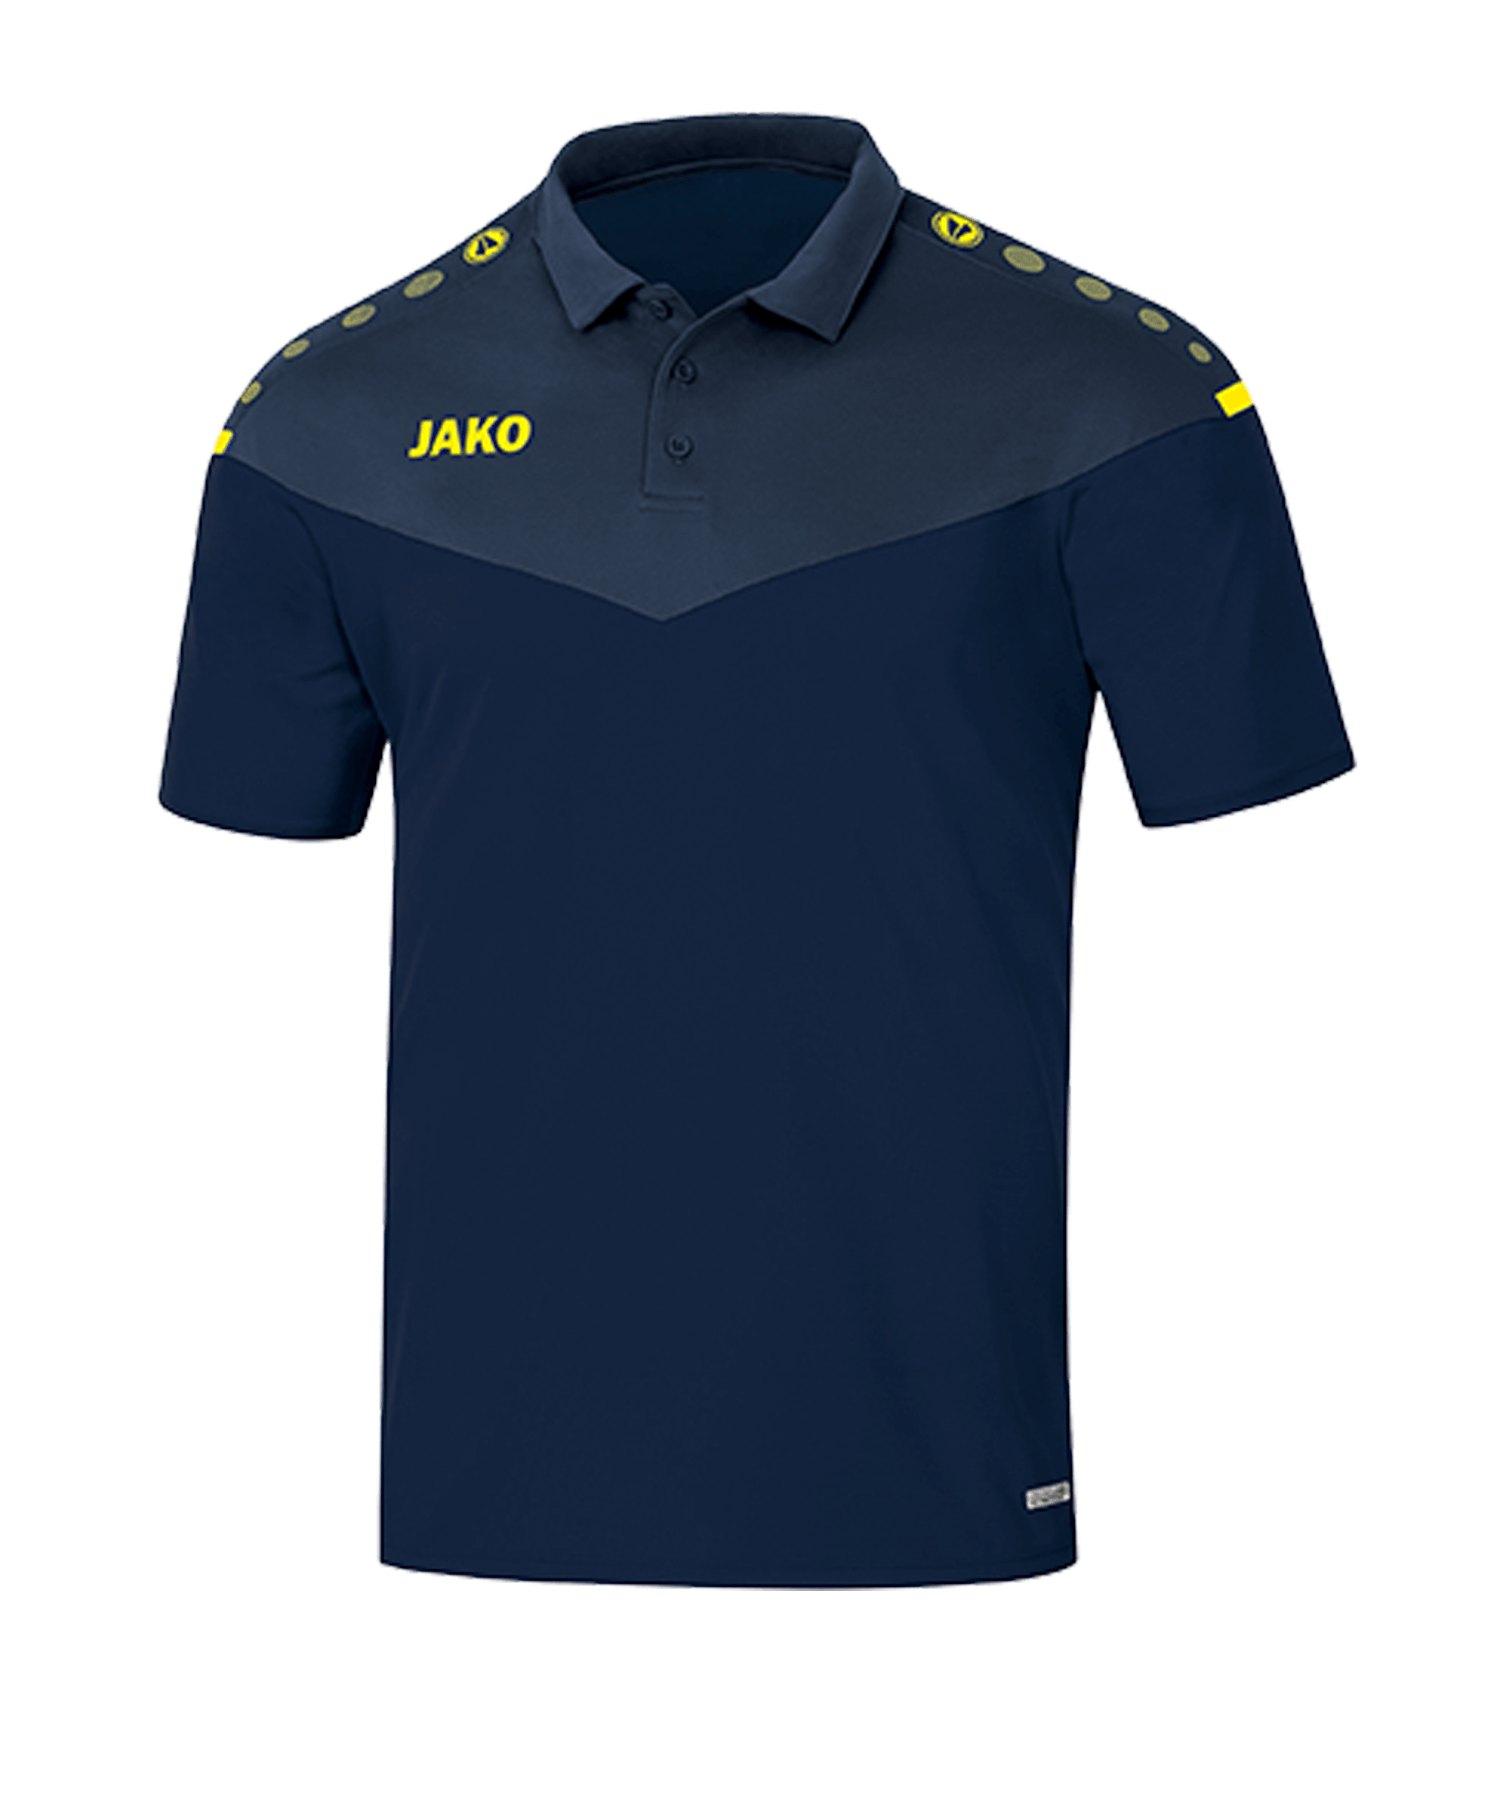 Jako Champ 2.0 Poloshirt Blau F93 - blau